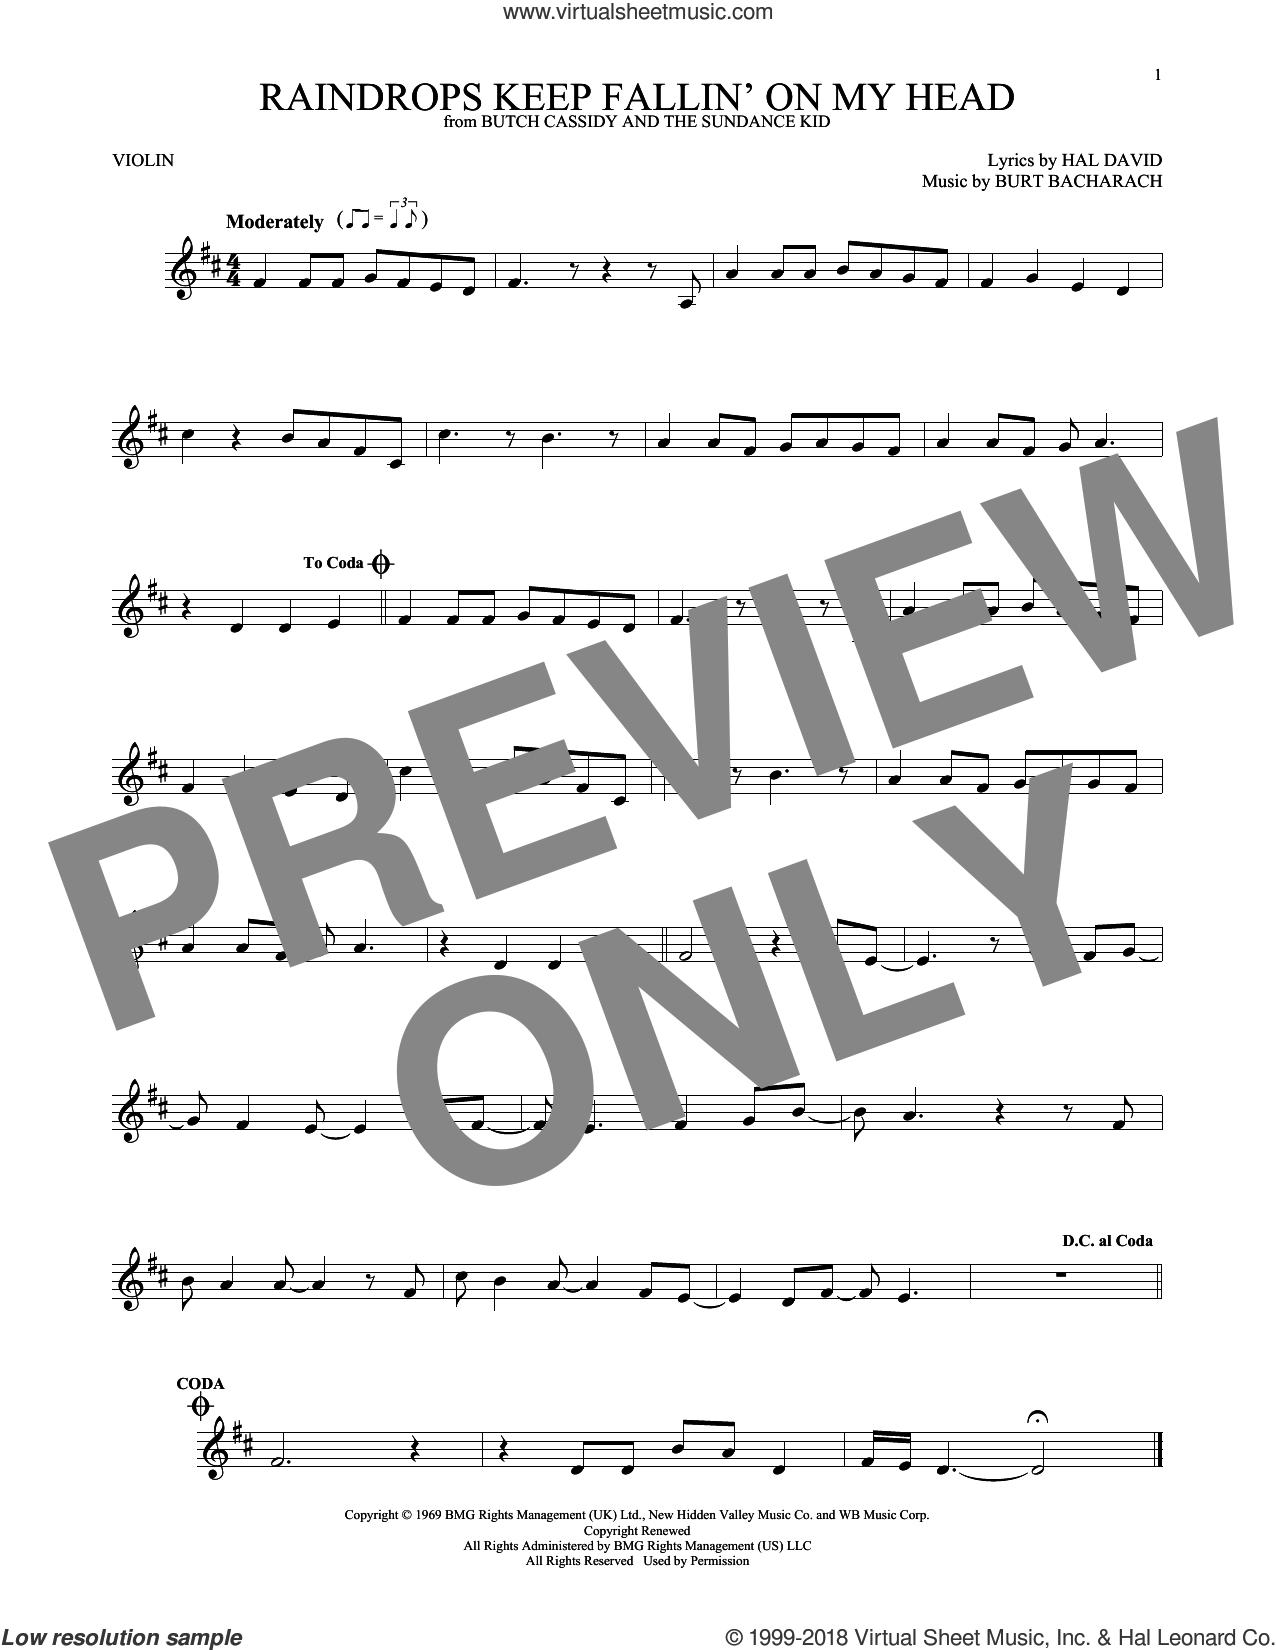 Raindrops Keep Fallin' On My Head sheet music for violin solo by Burt Bacharach, B.J. Thomas and Hal David, intermediate skill level